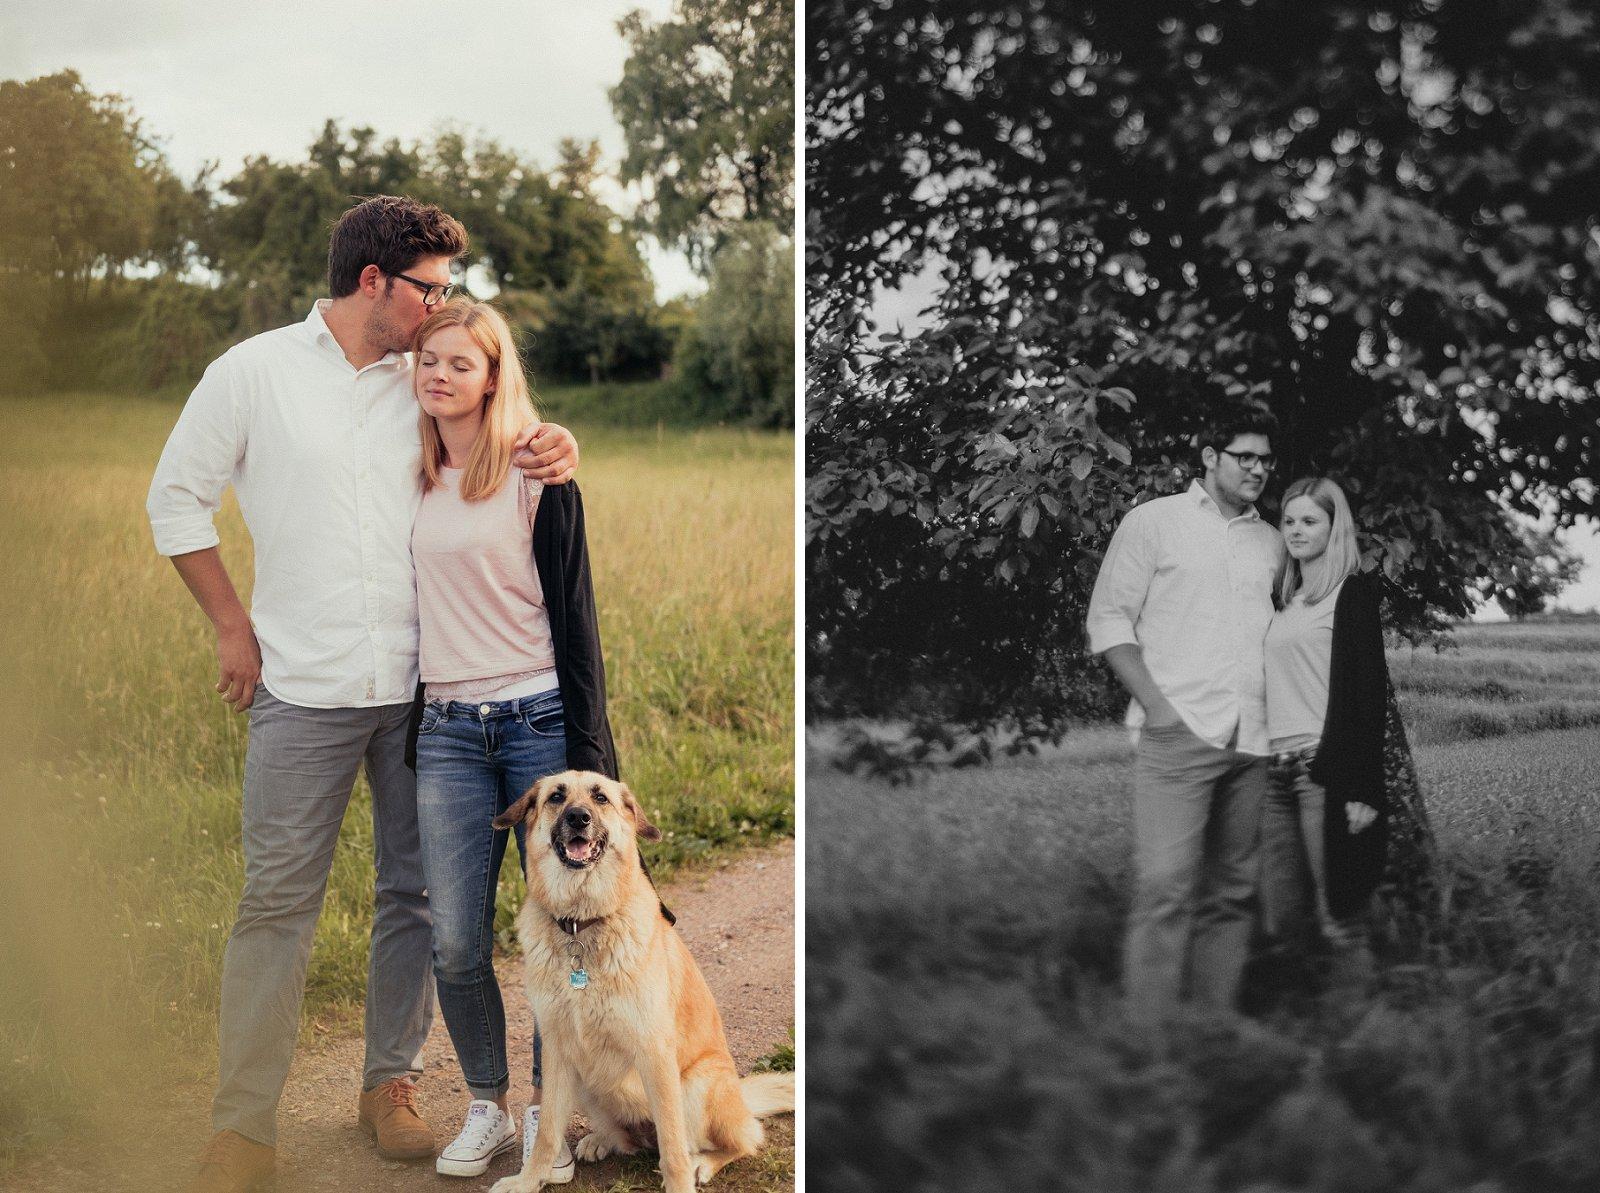 Engagement-Shooting in Ettenheimweiler - Monya und Dirk